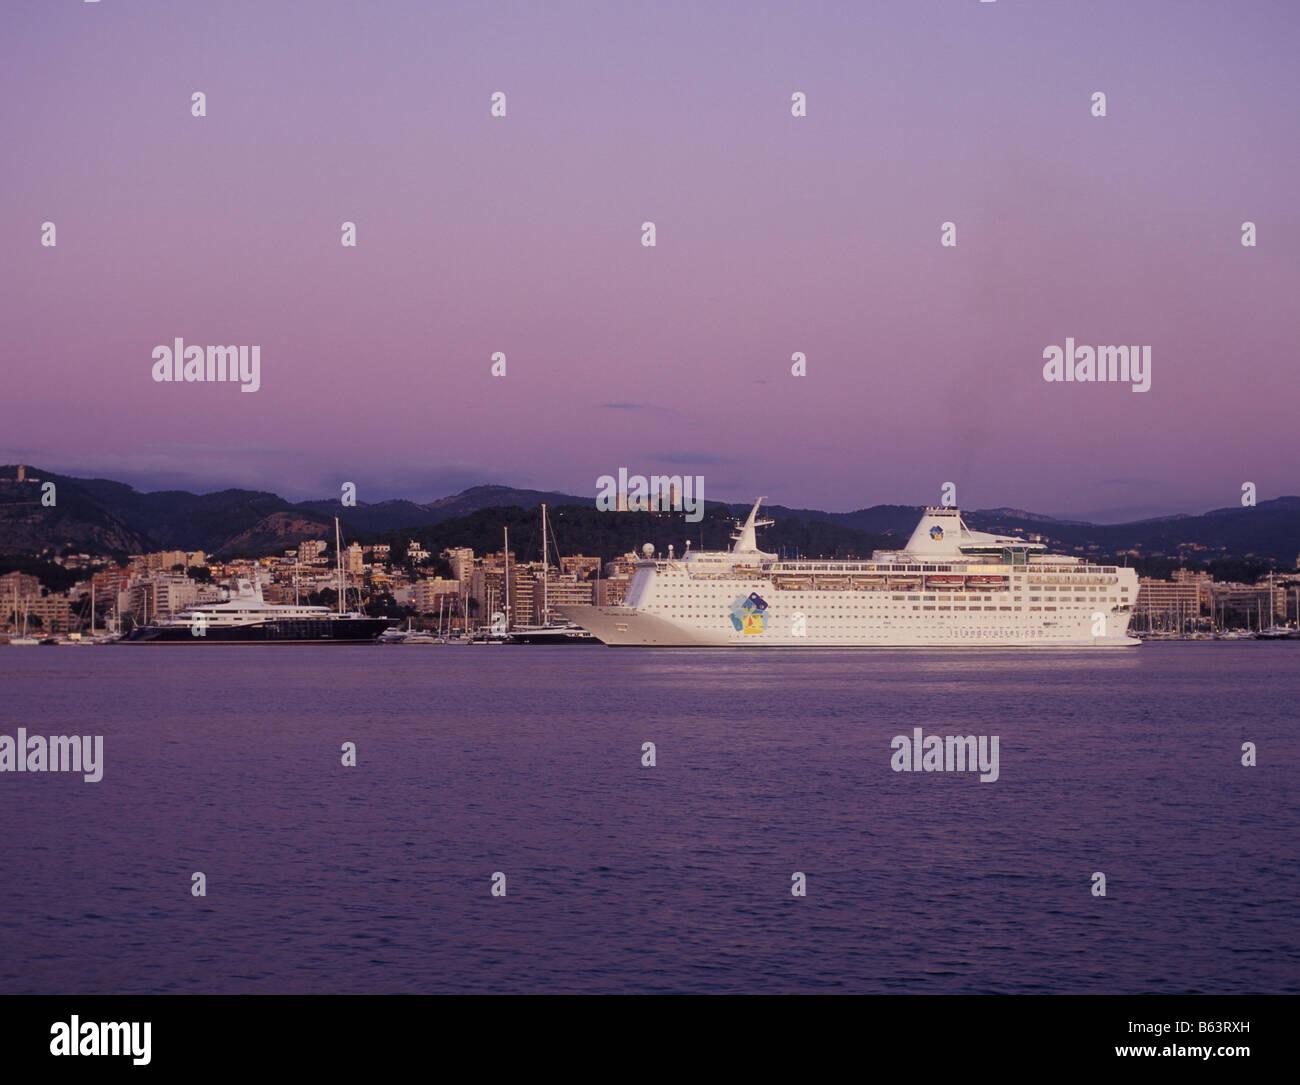 Island Cruises cruise liner Island Escape entering port at sunrise - Port of Palma de Mallorca, Balearic Islands, Stock Photo